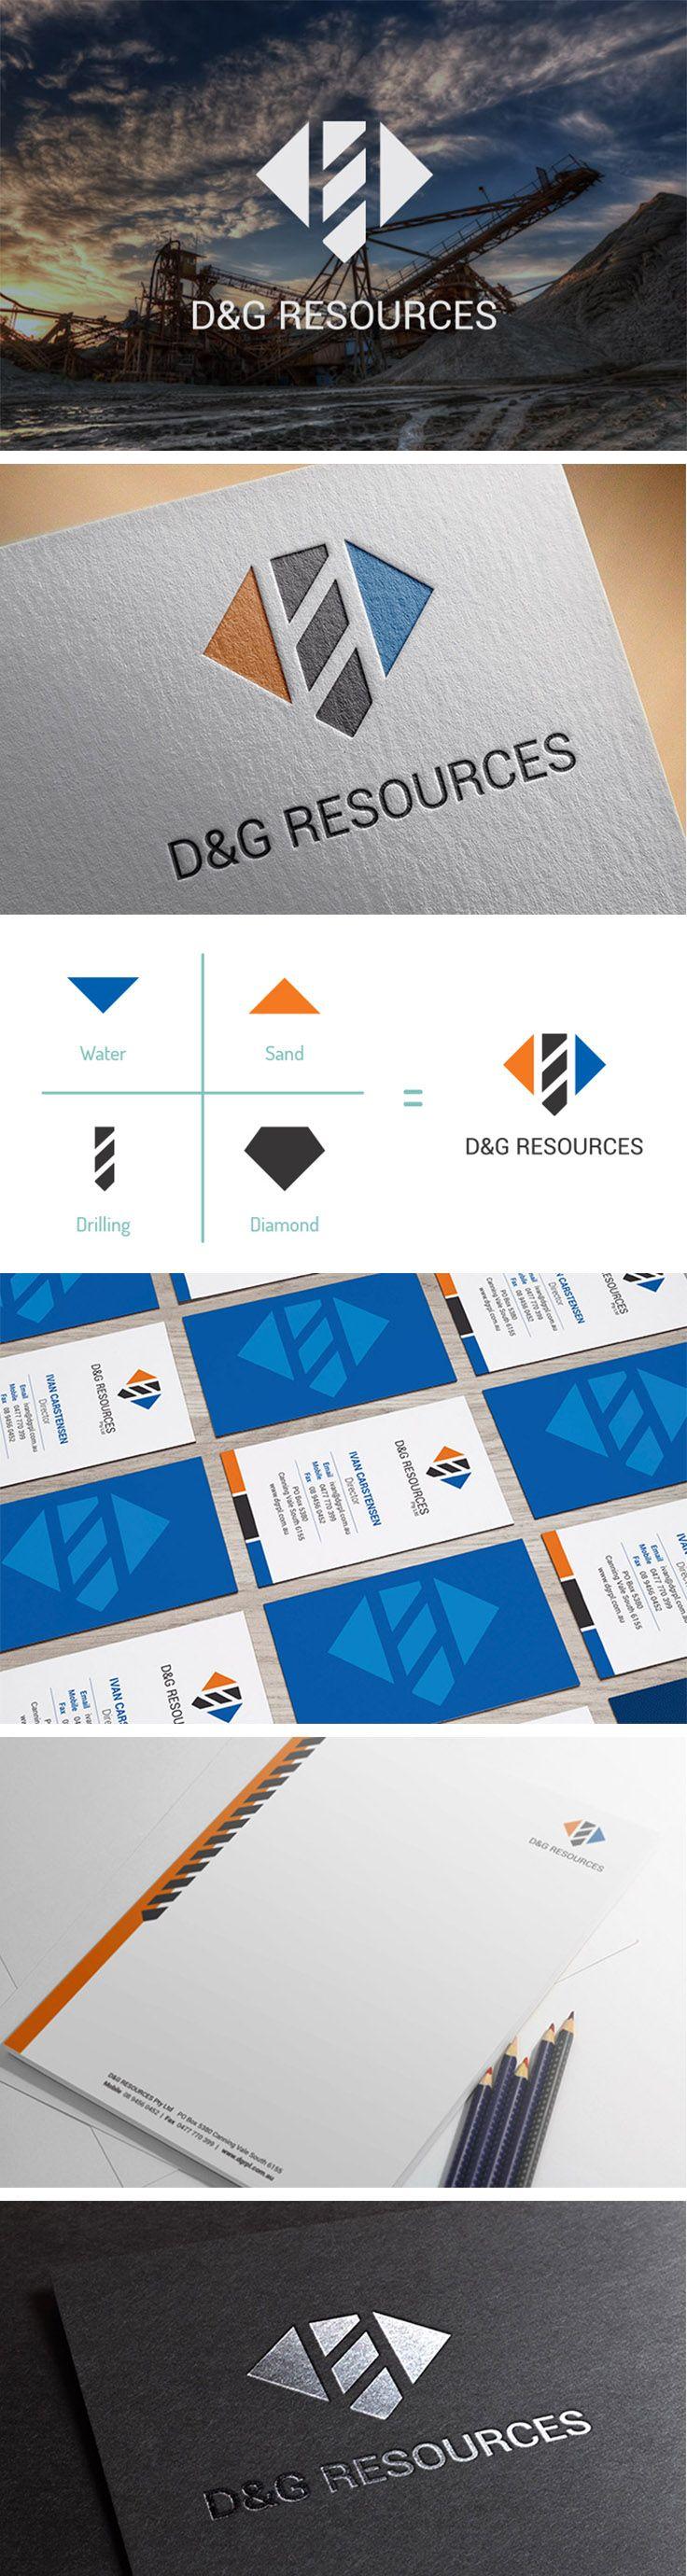 Logo Design Mining, Branding Drilling & Grouting     geometric, triangle, modern, minimalist, mark, mineral, trade, corporate     D&G Resources, Carlisle     Valhalla Creative Design, Perth